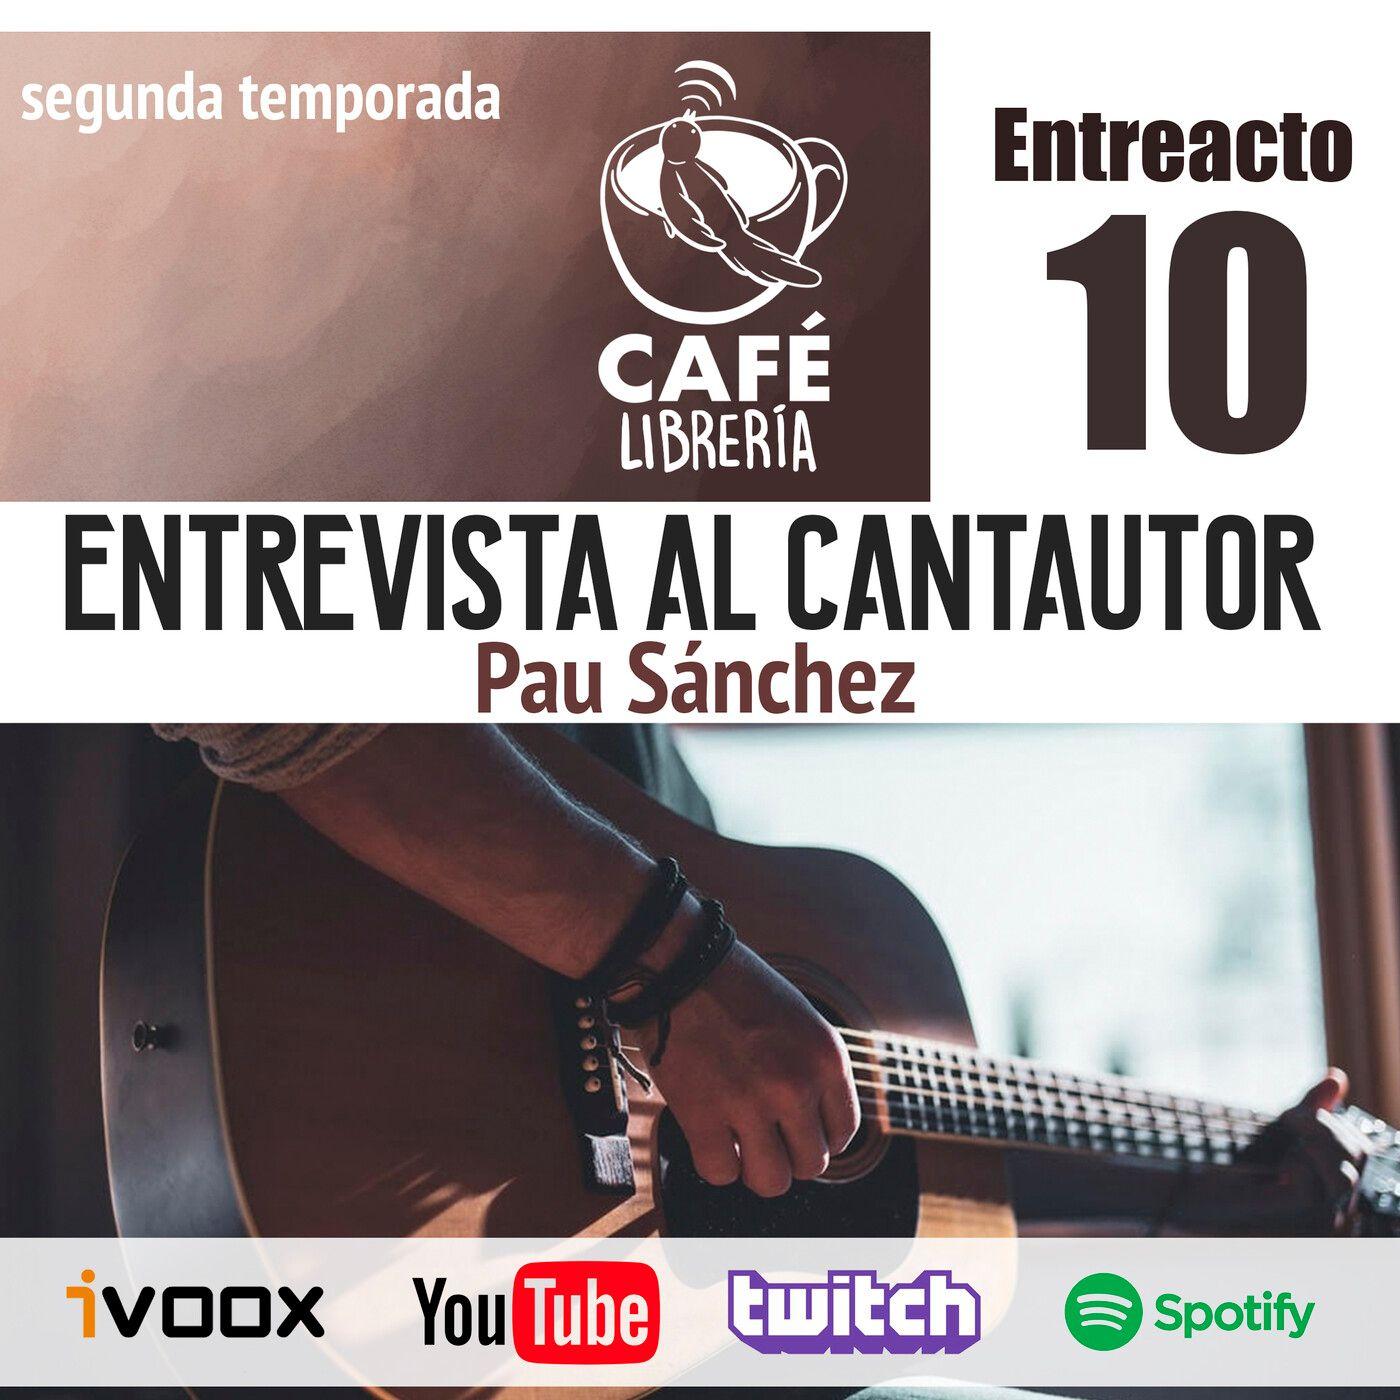 Temporada 2, Entreacto X - Entrevista al cantautor Pau Sánchez